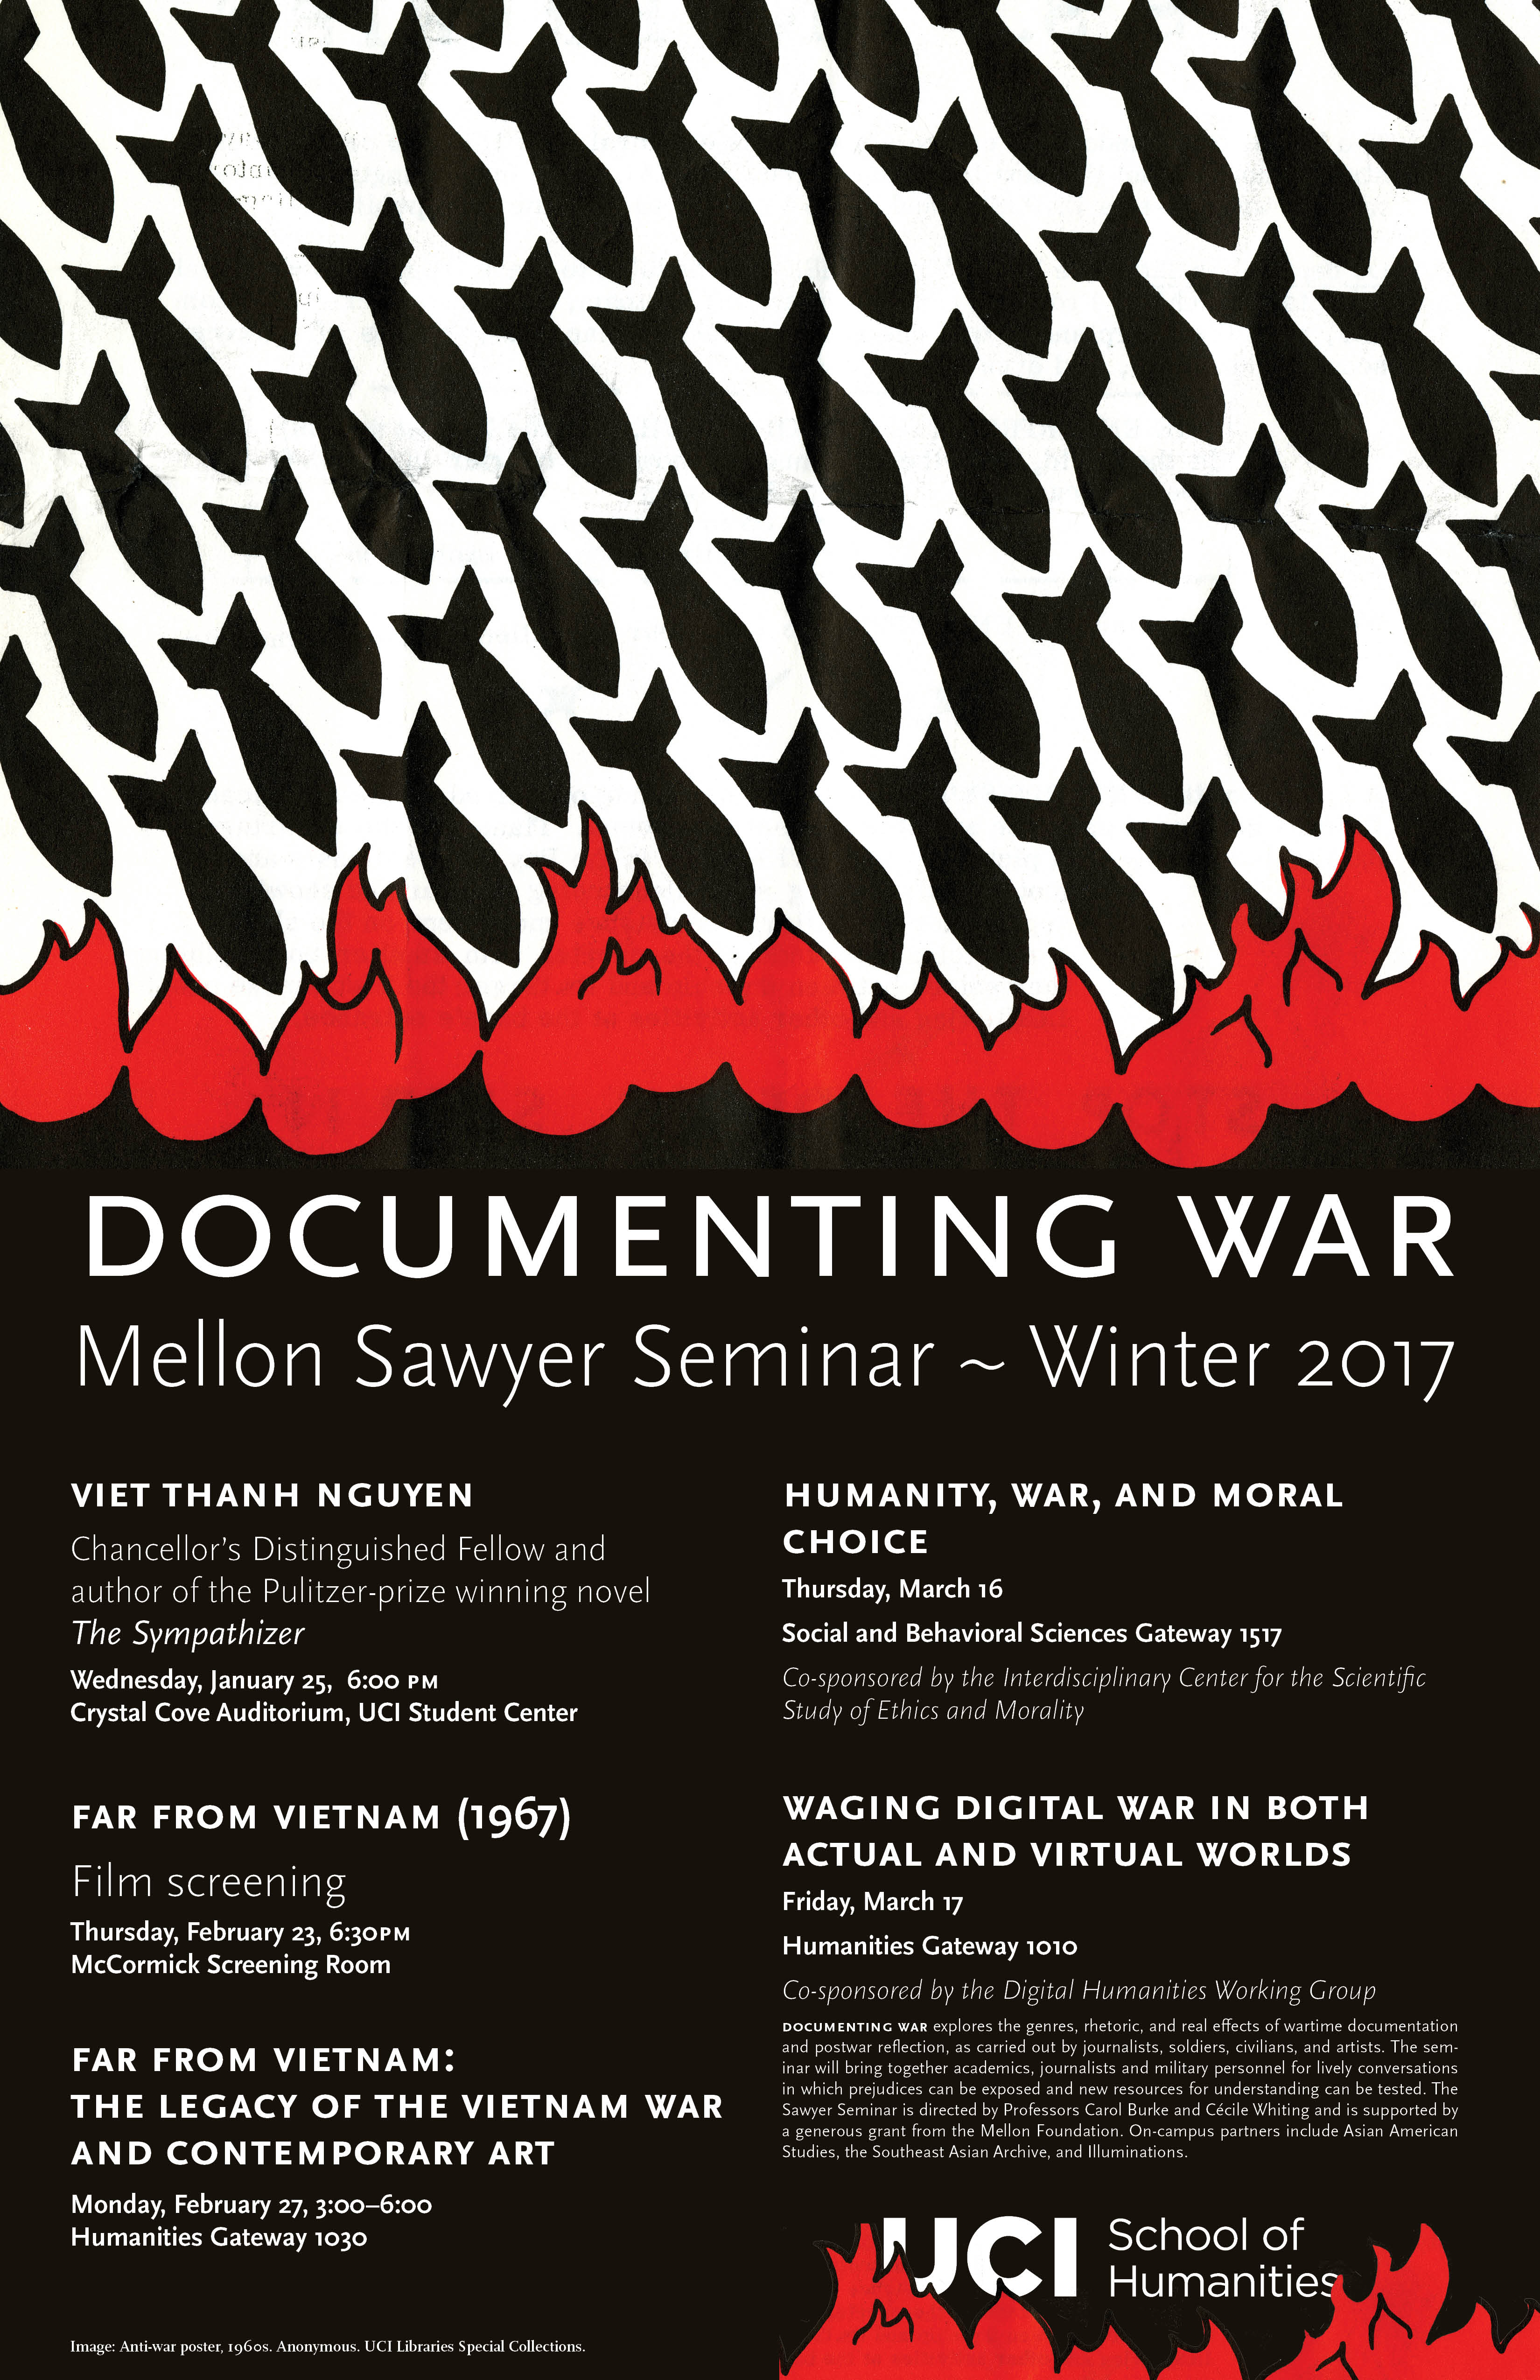 Documenting War Winter 2017